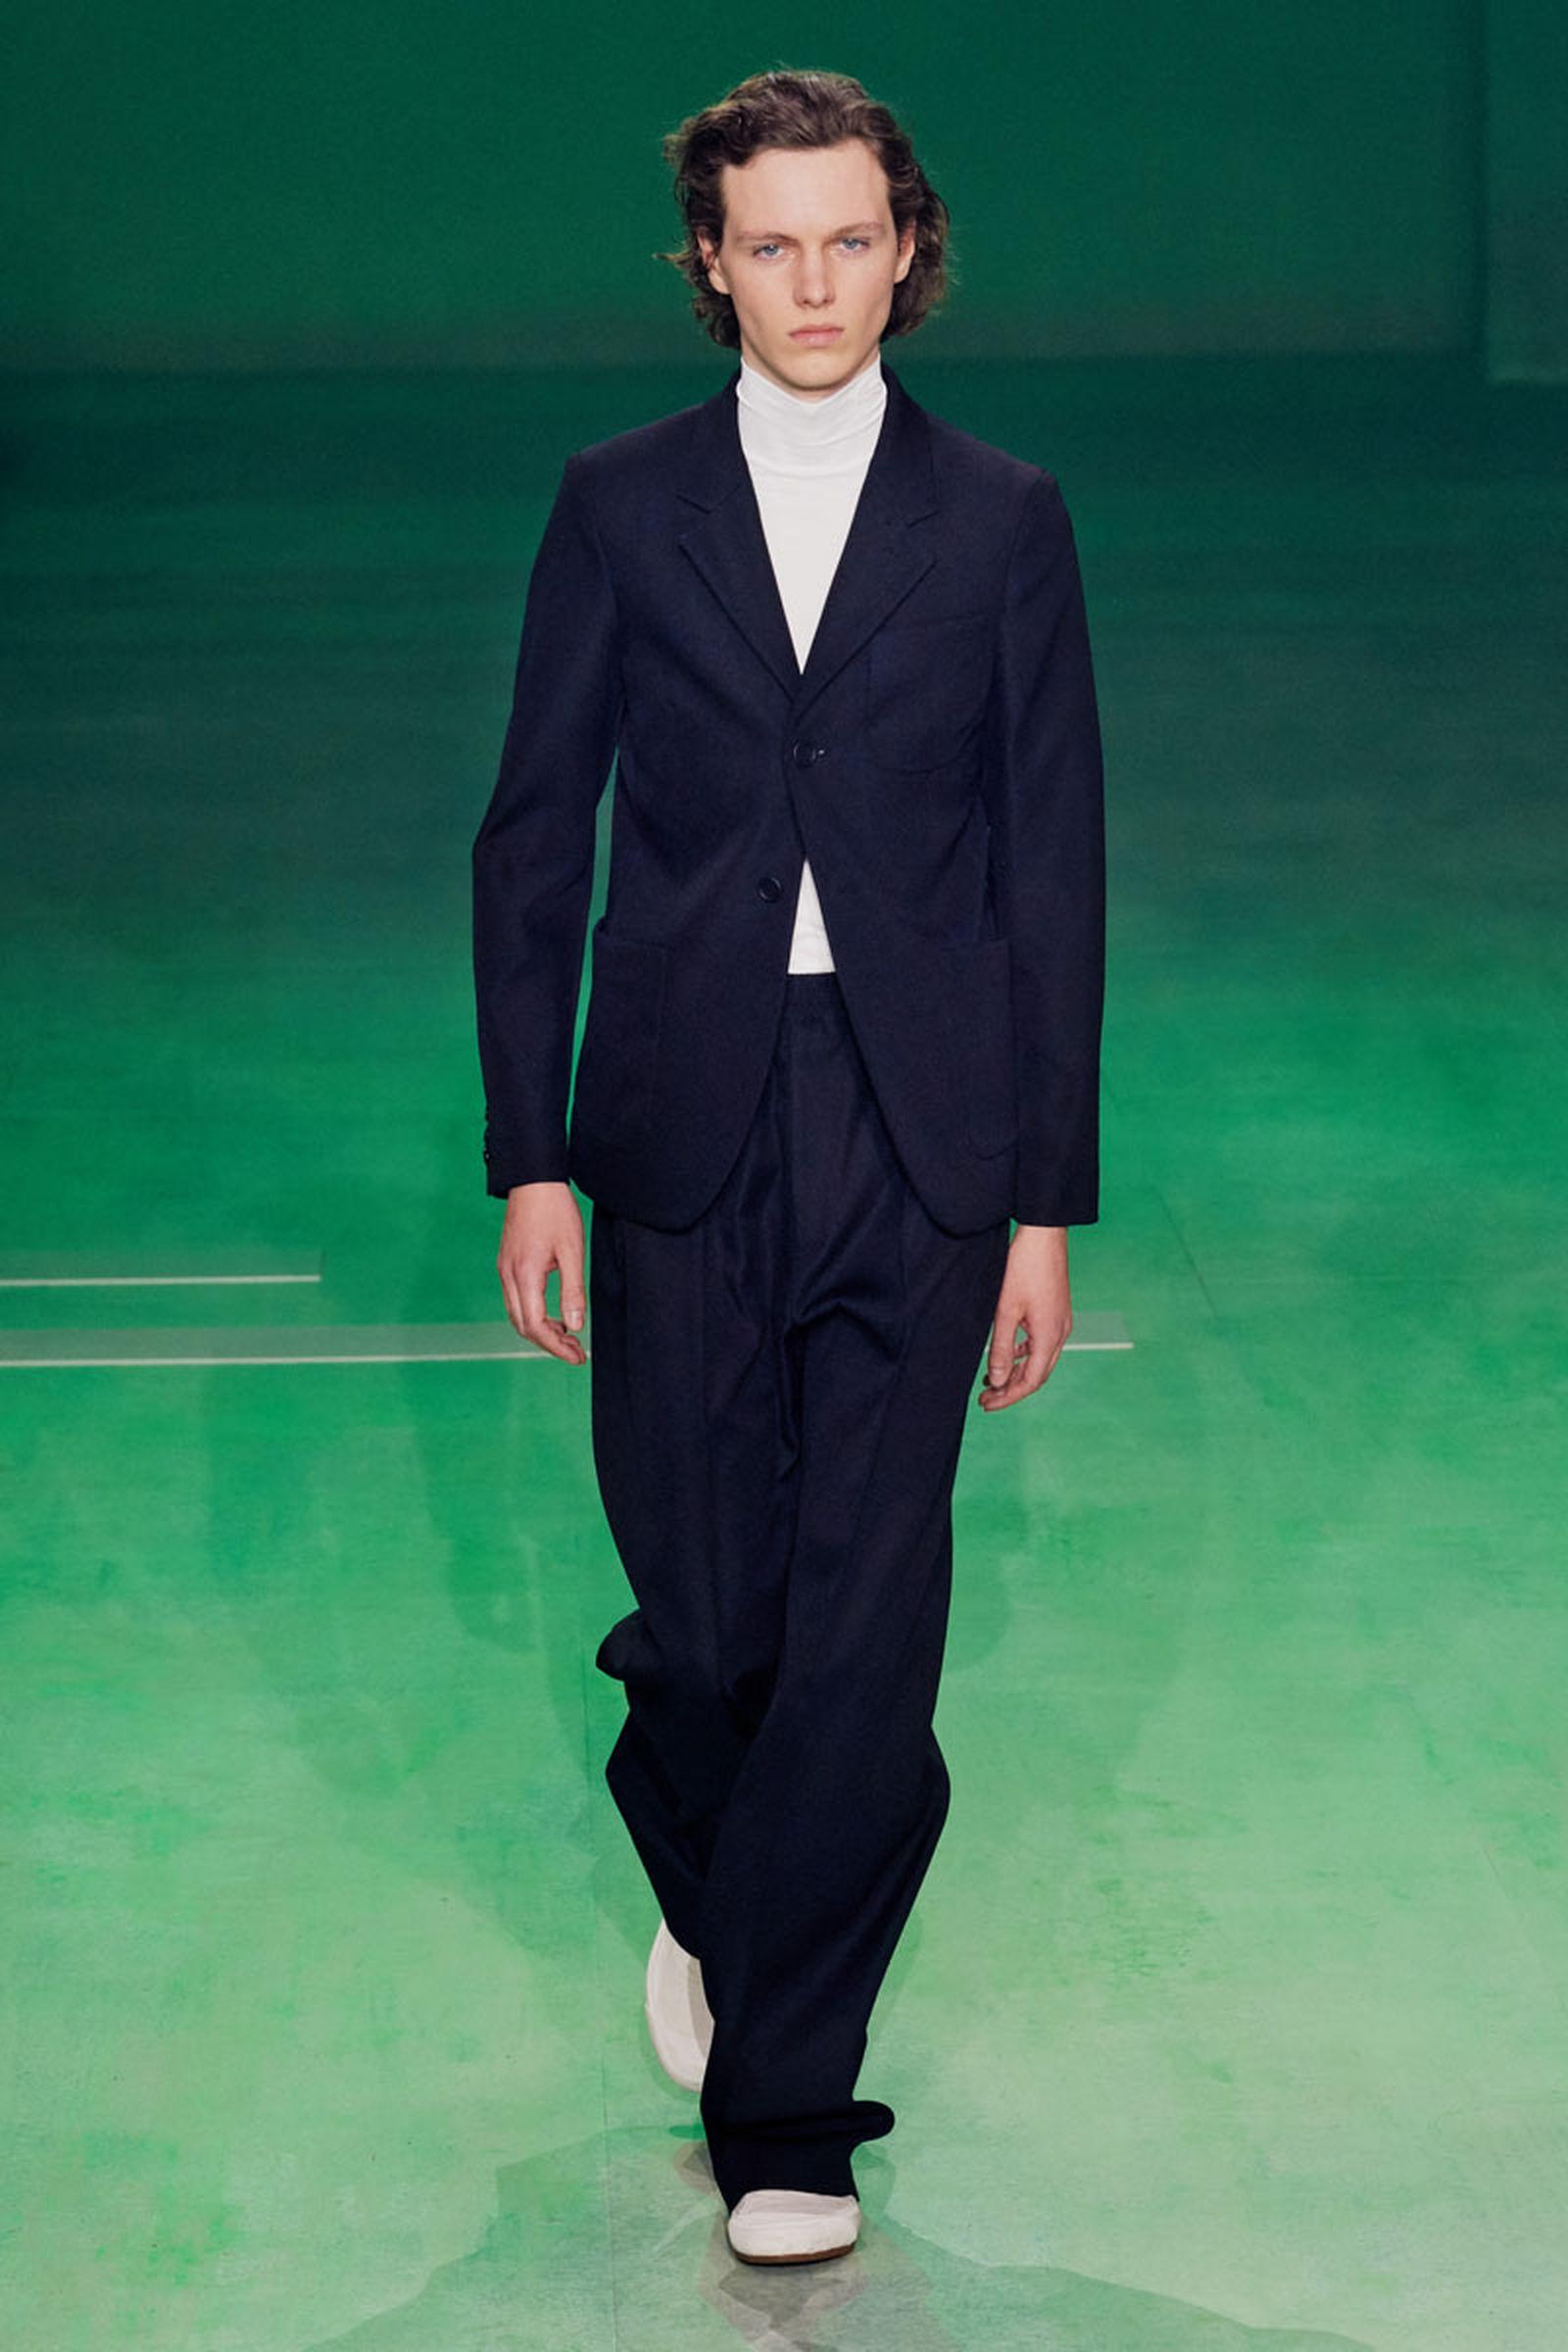 45lascoste fw19 paris fashion week Louise Trotter lacoste runway